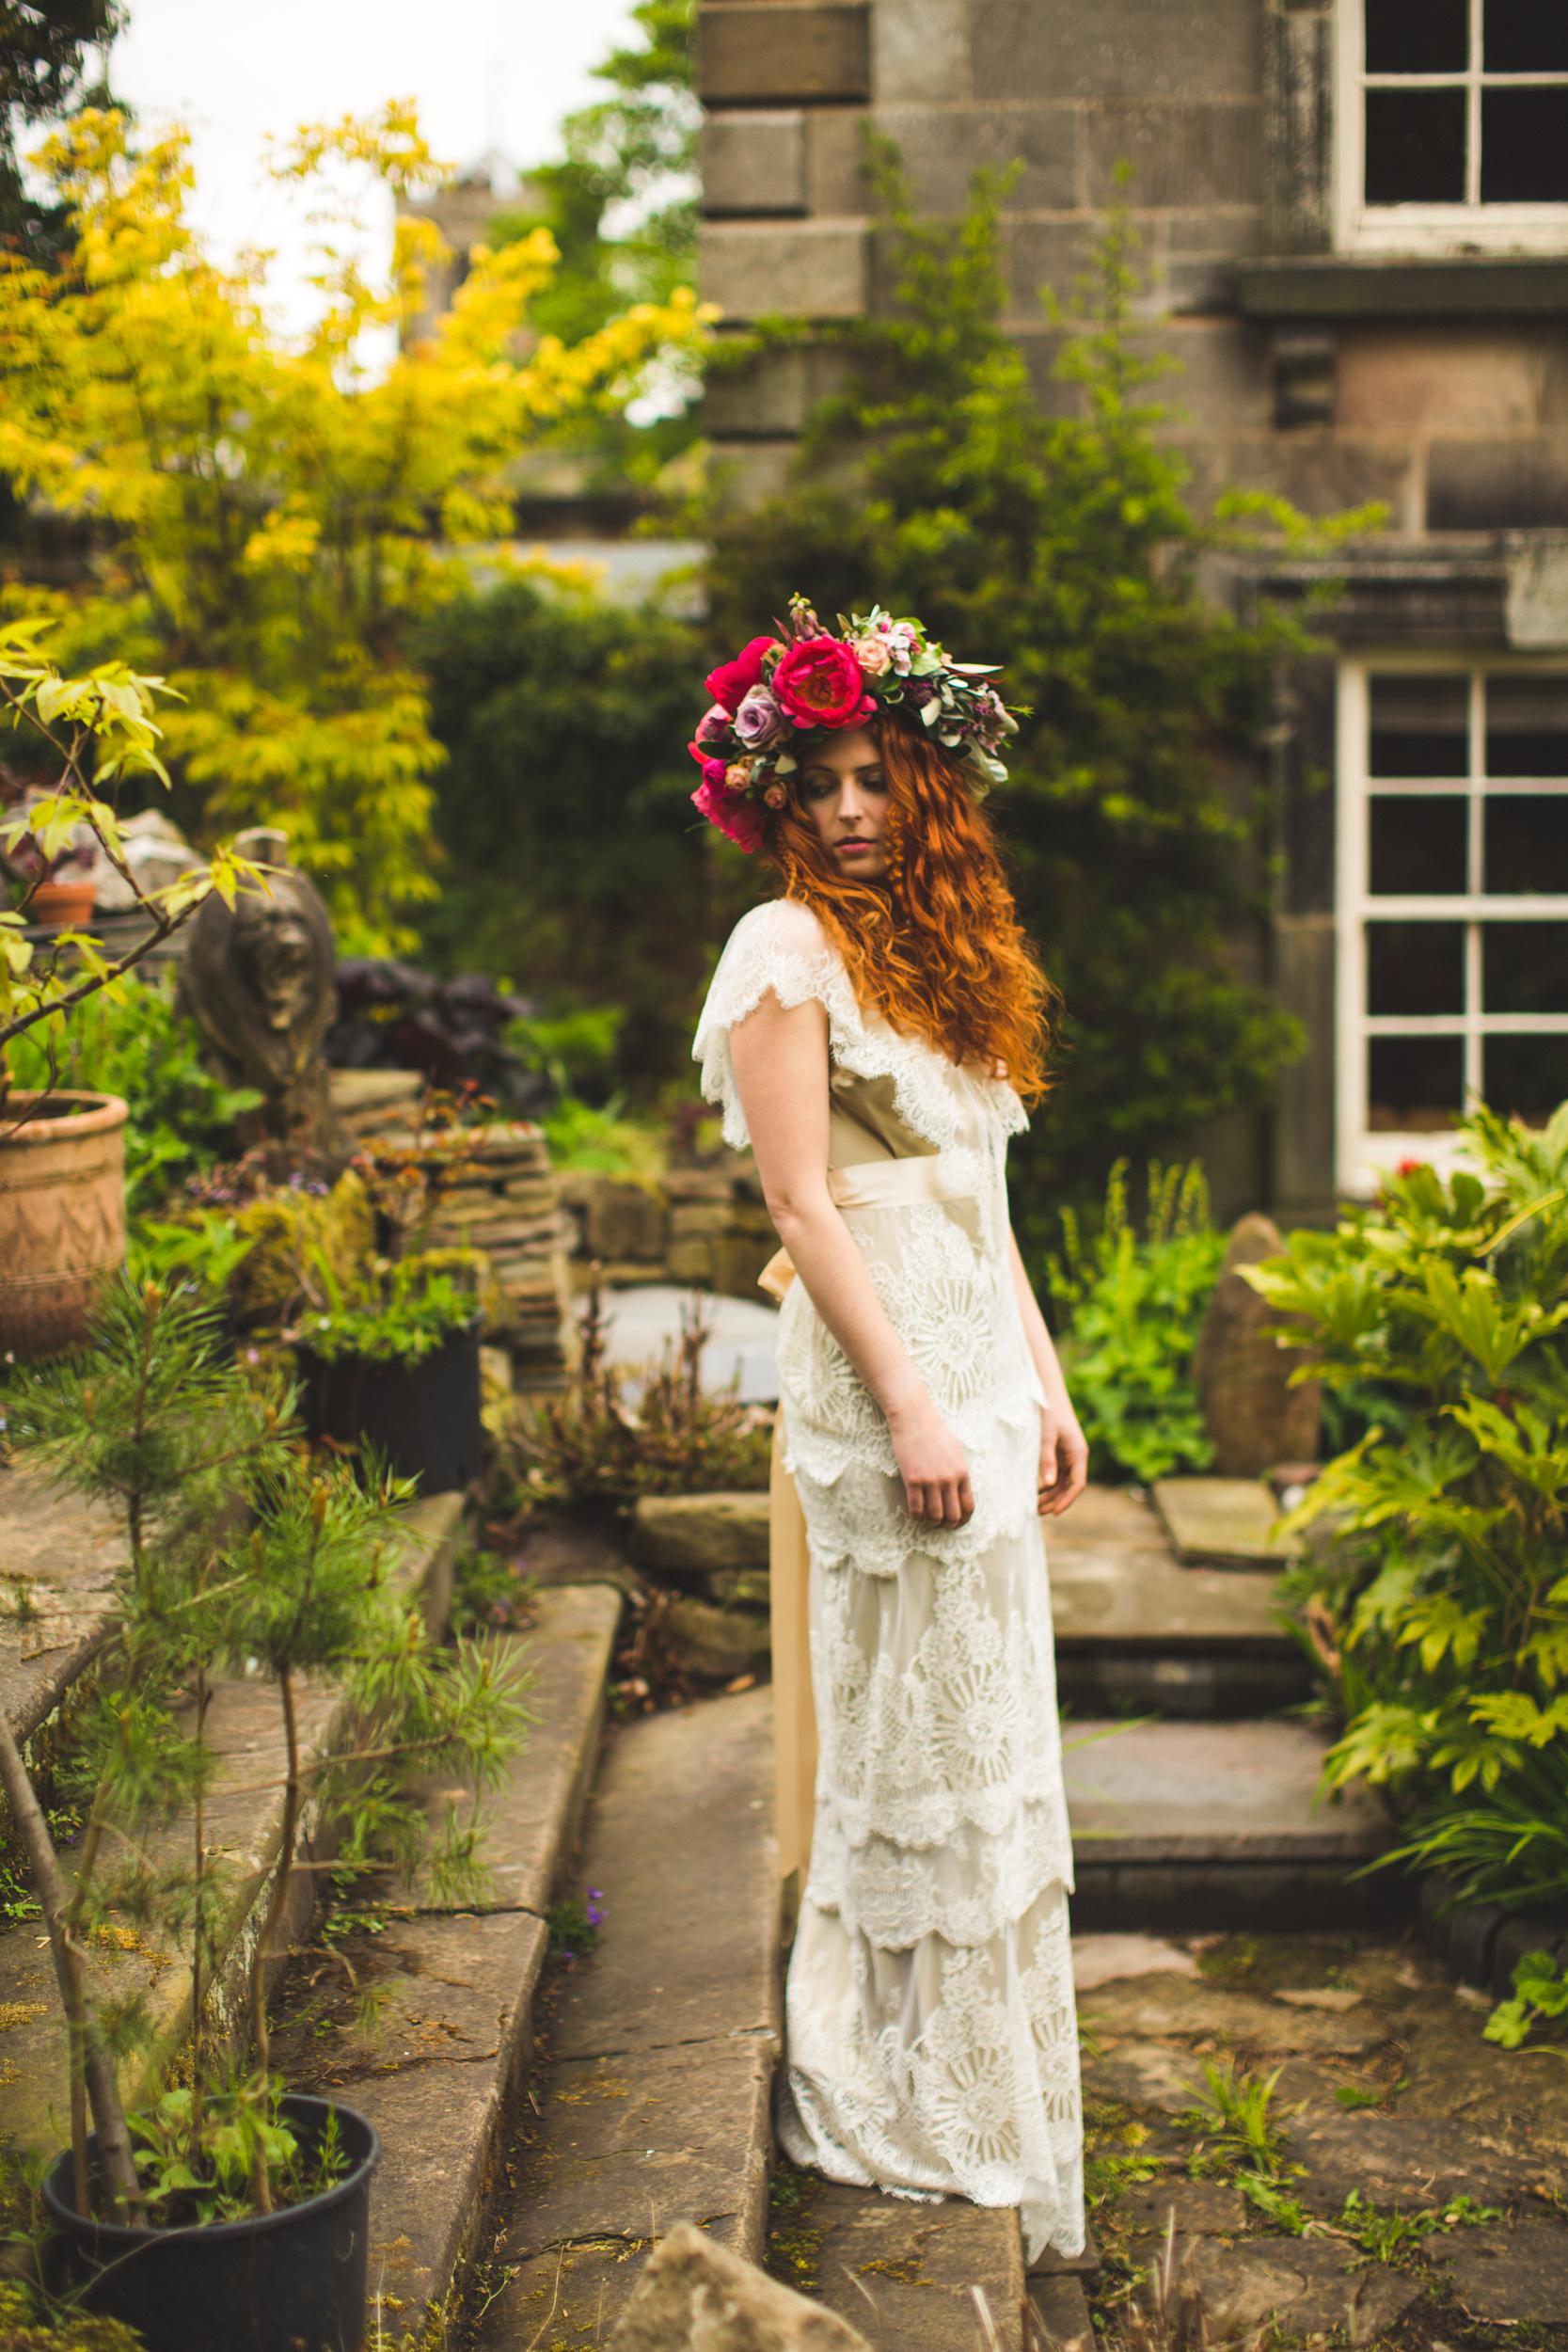 kate-beaumont-vintage-inspired-bridal-wedding-dresses-Sheffield-S6-8.jpg